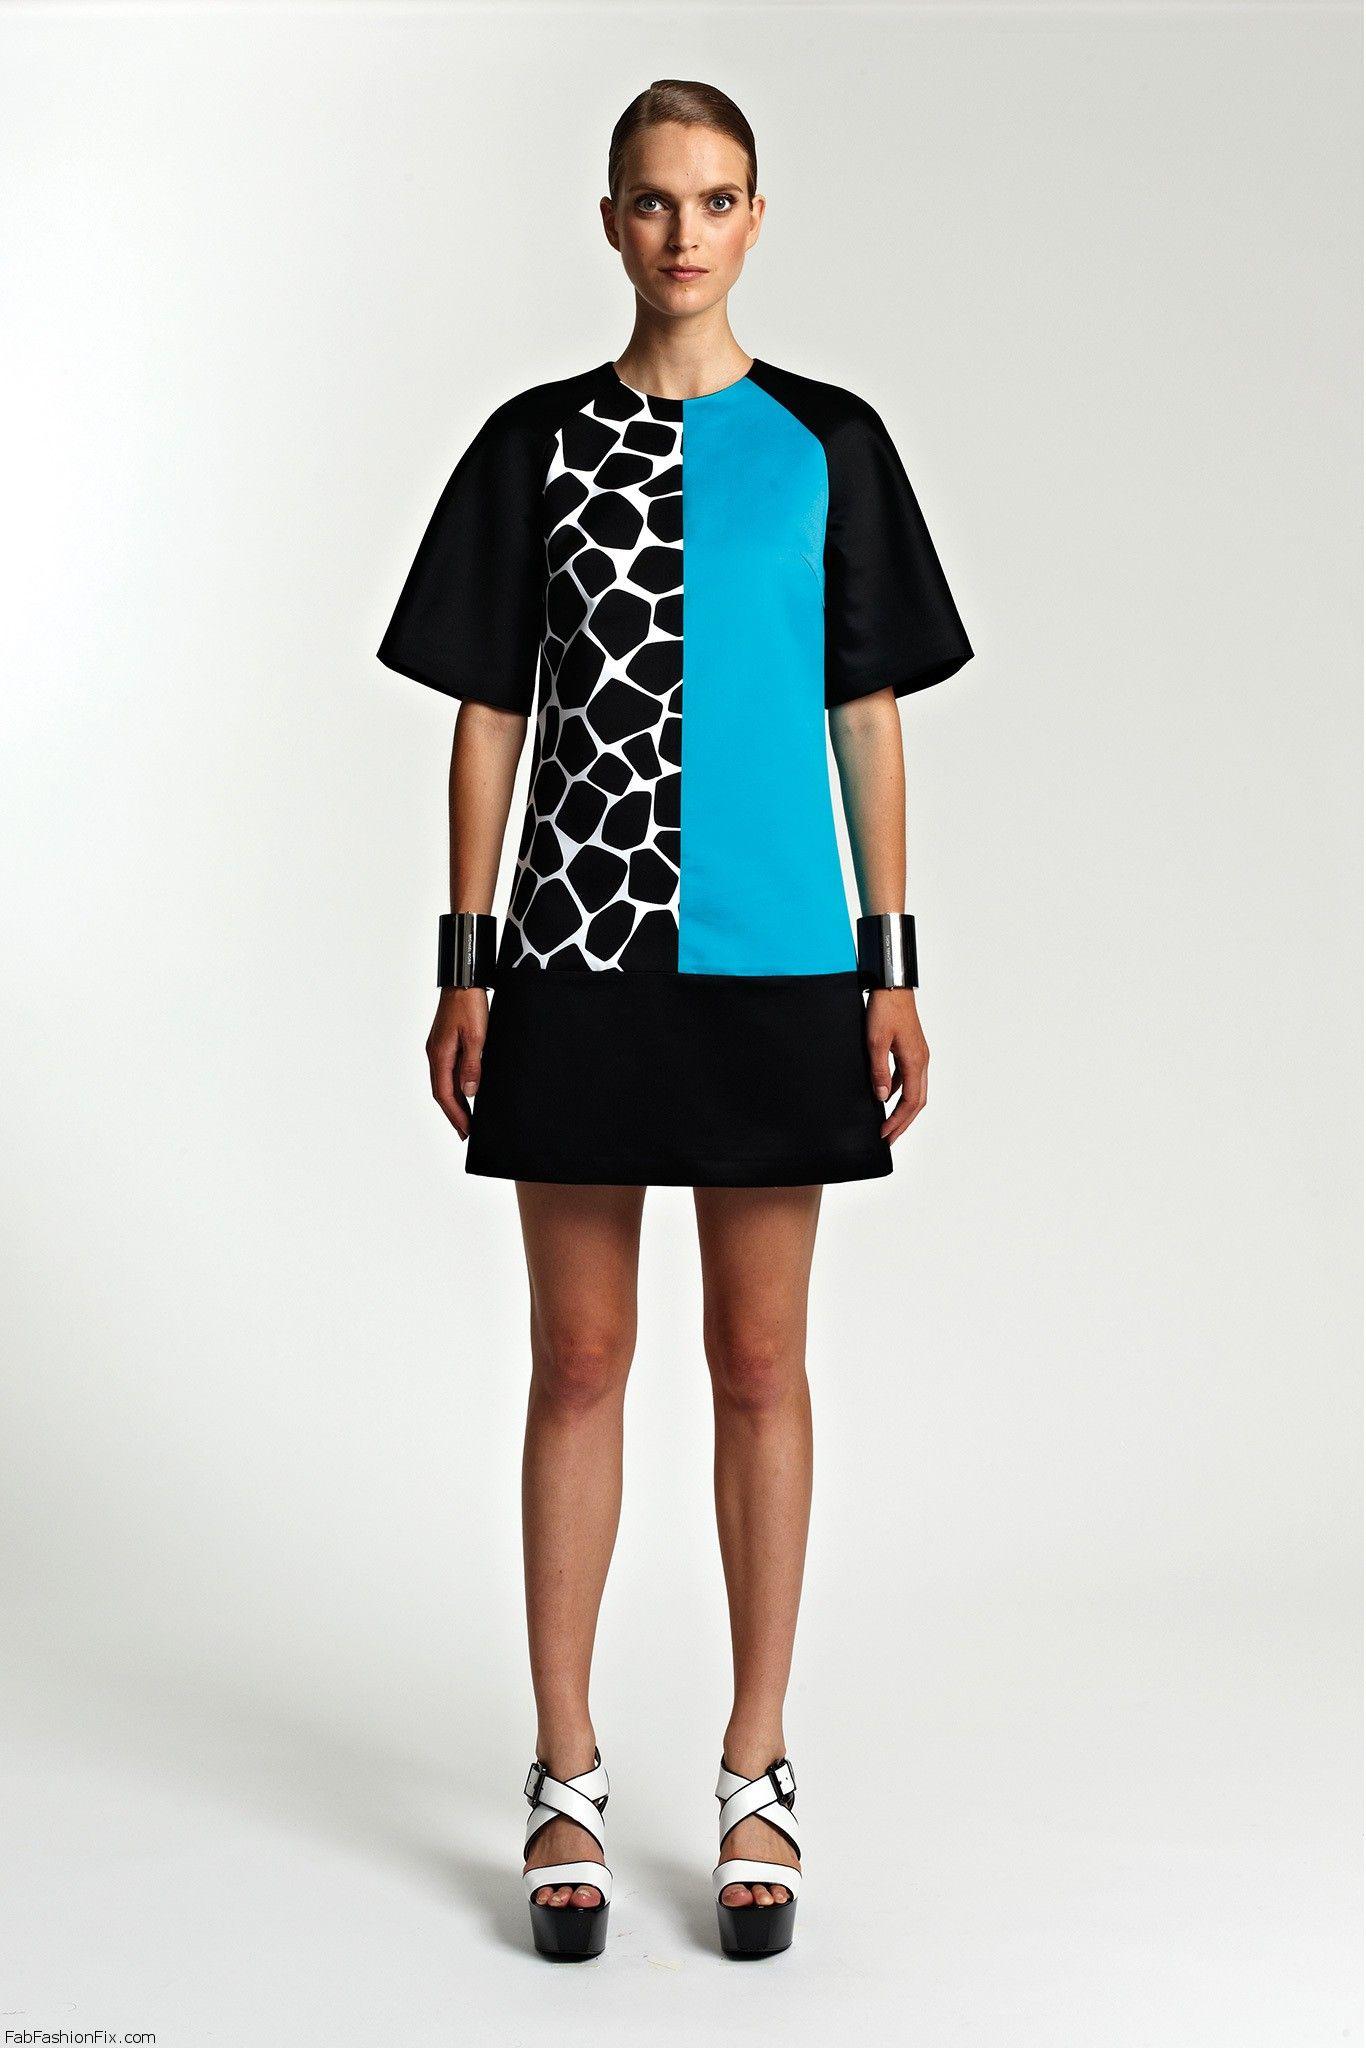 fashion designer michael kors 6nqw  MichaelKors_020_13661366x2048